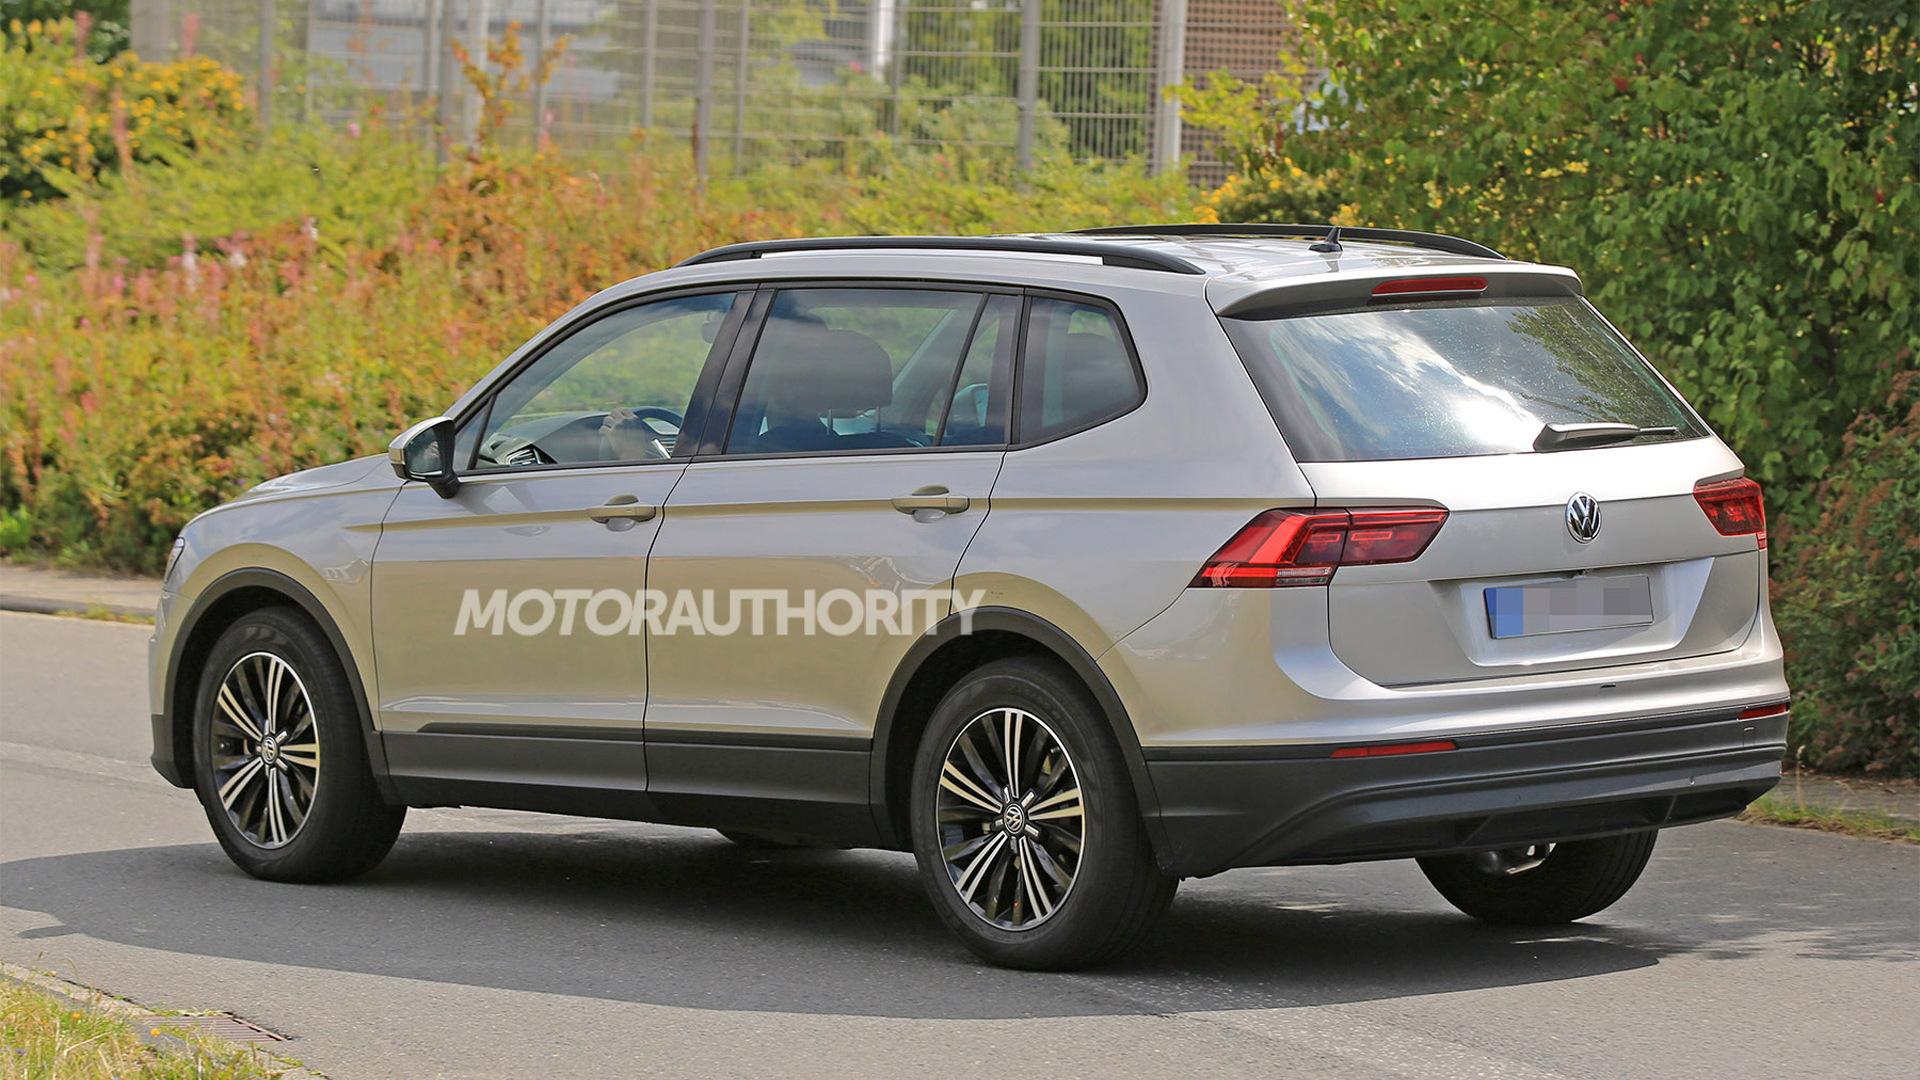 2018 Volkswagen Tiguan long-wheelbase model - Image via S. Baldauf/SB-Medien